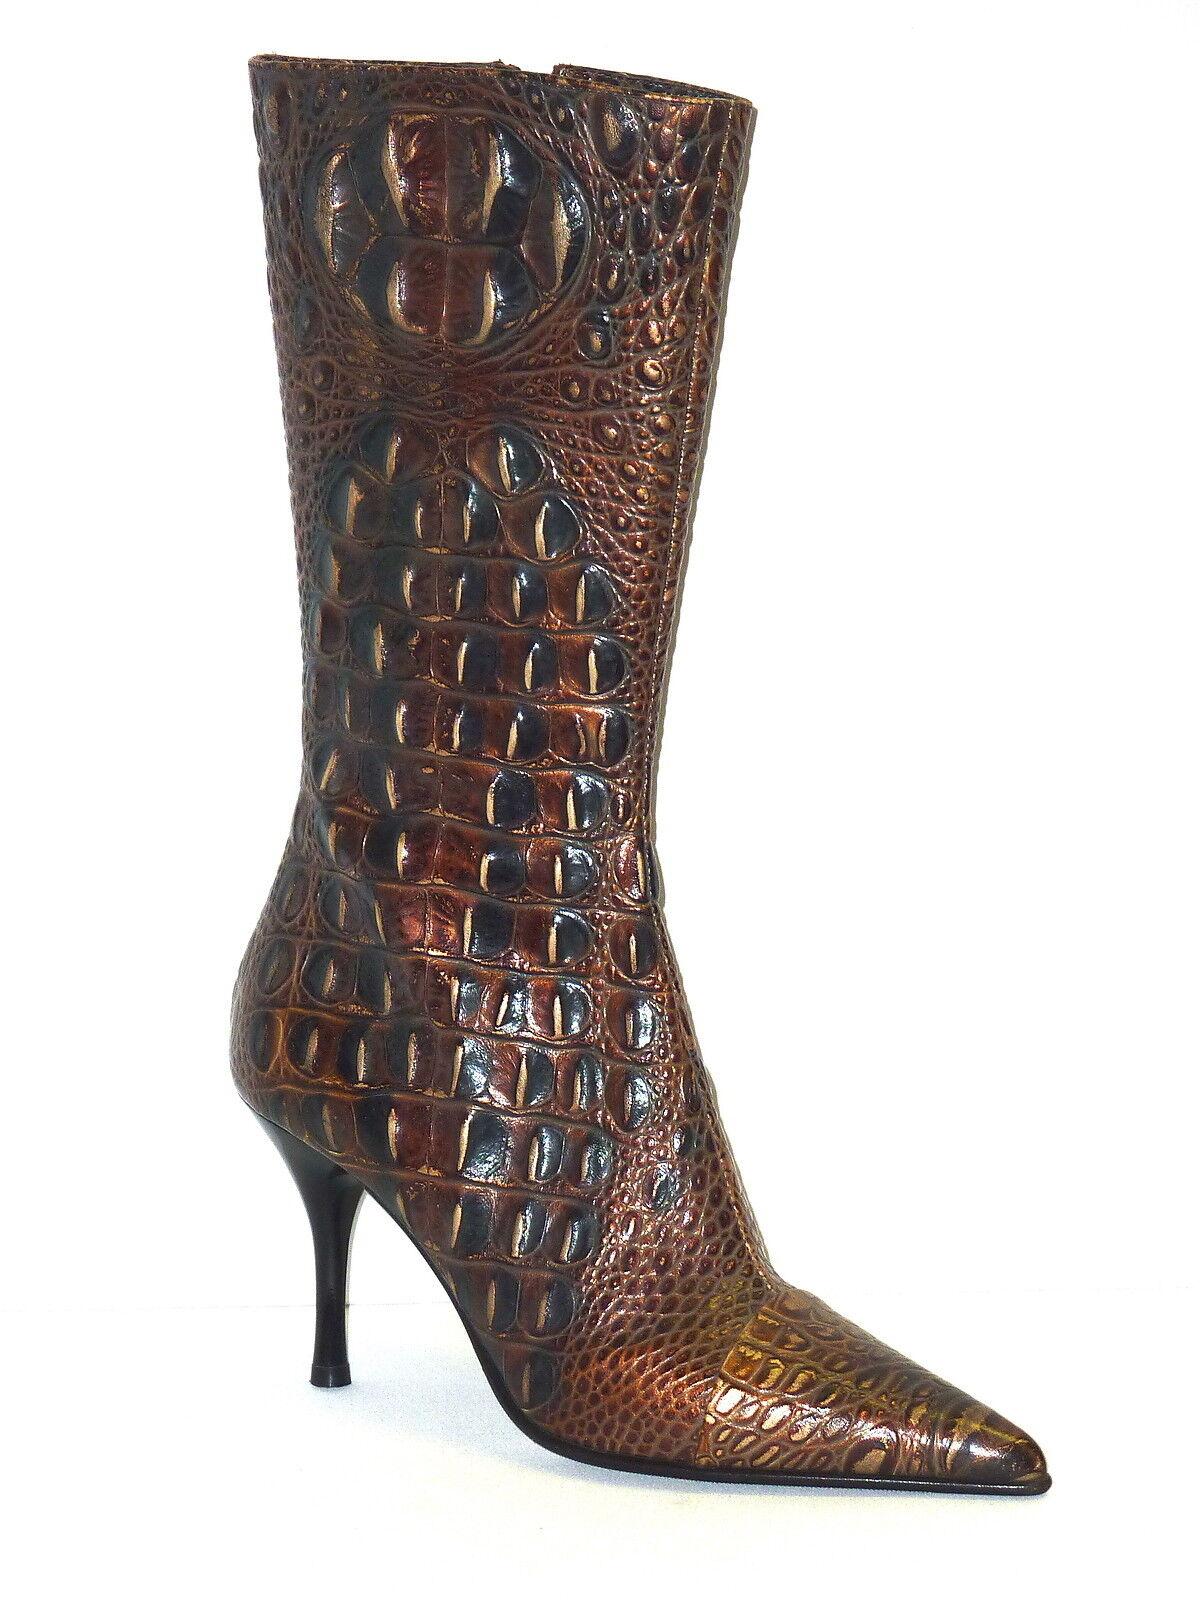 LORIbleu bottes femmes chaussures STIVALETTI PELLE STAMPA COCCODRILLO TACCO MEDIO 38